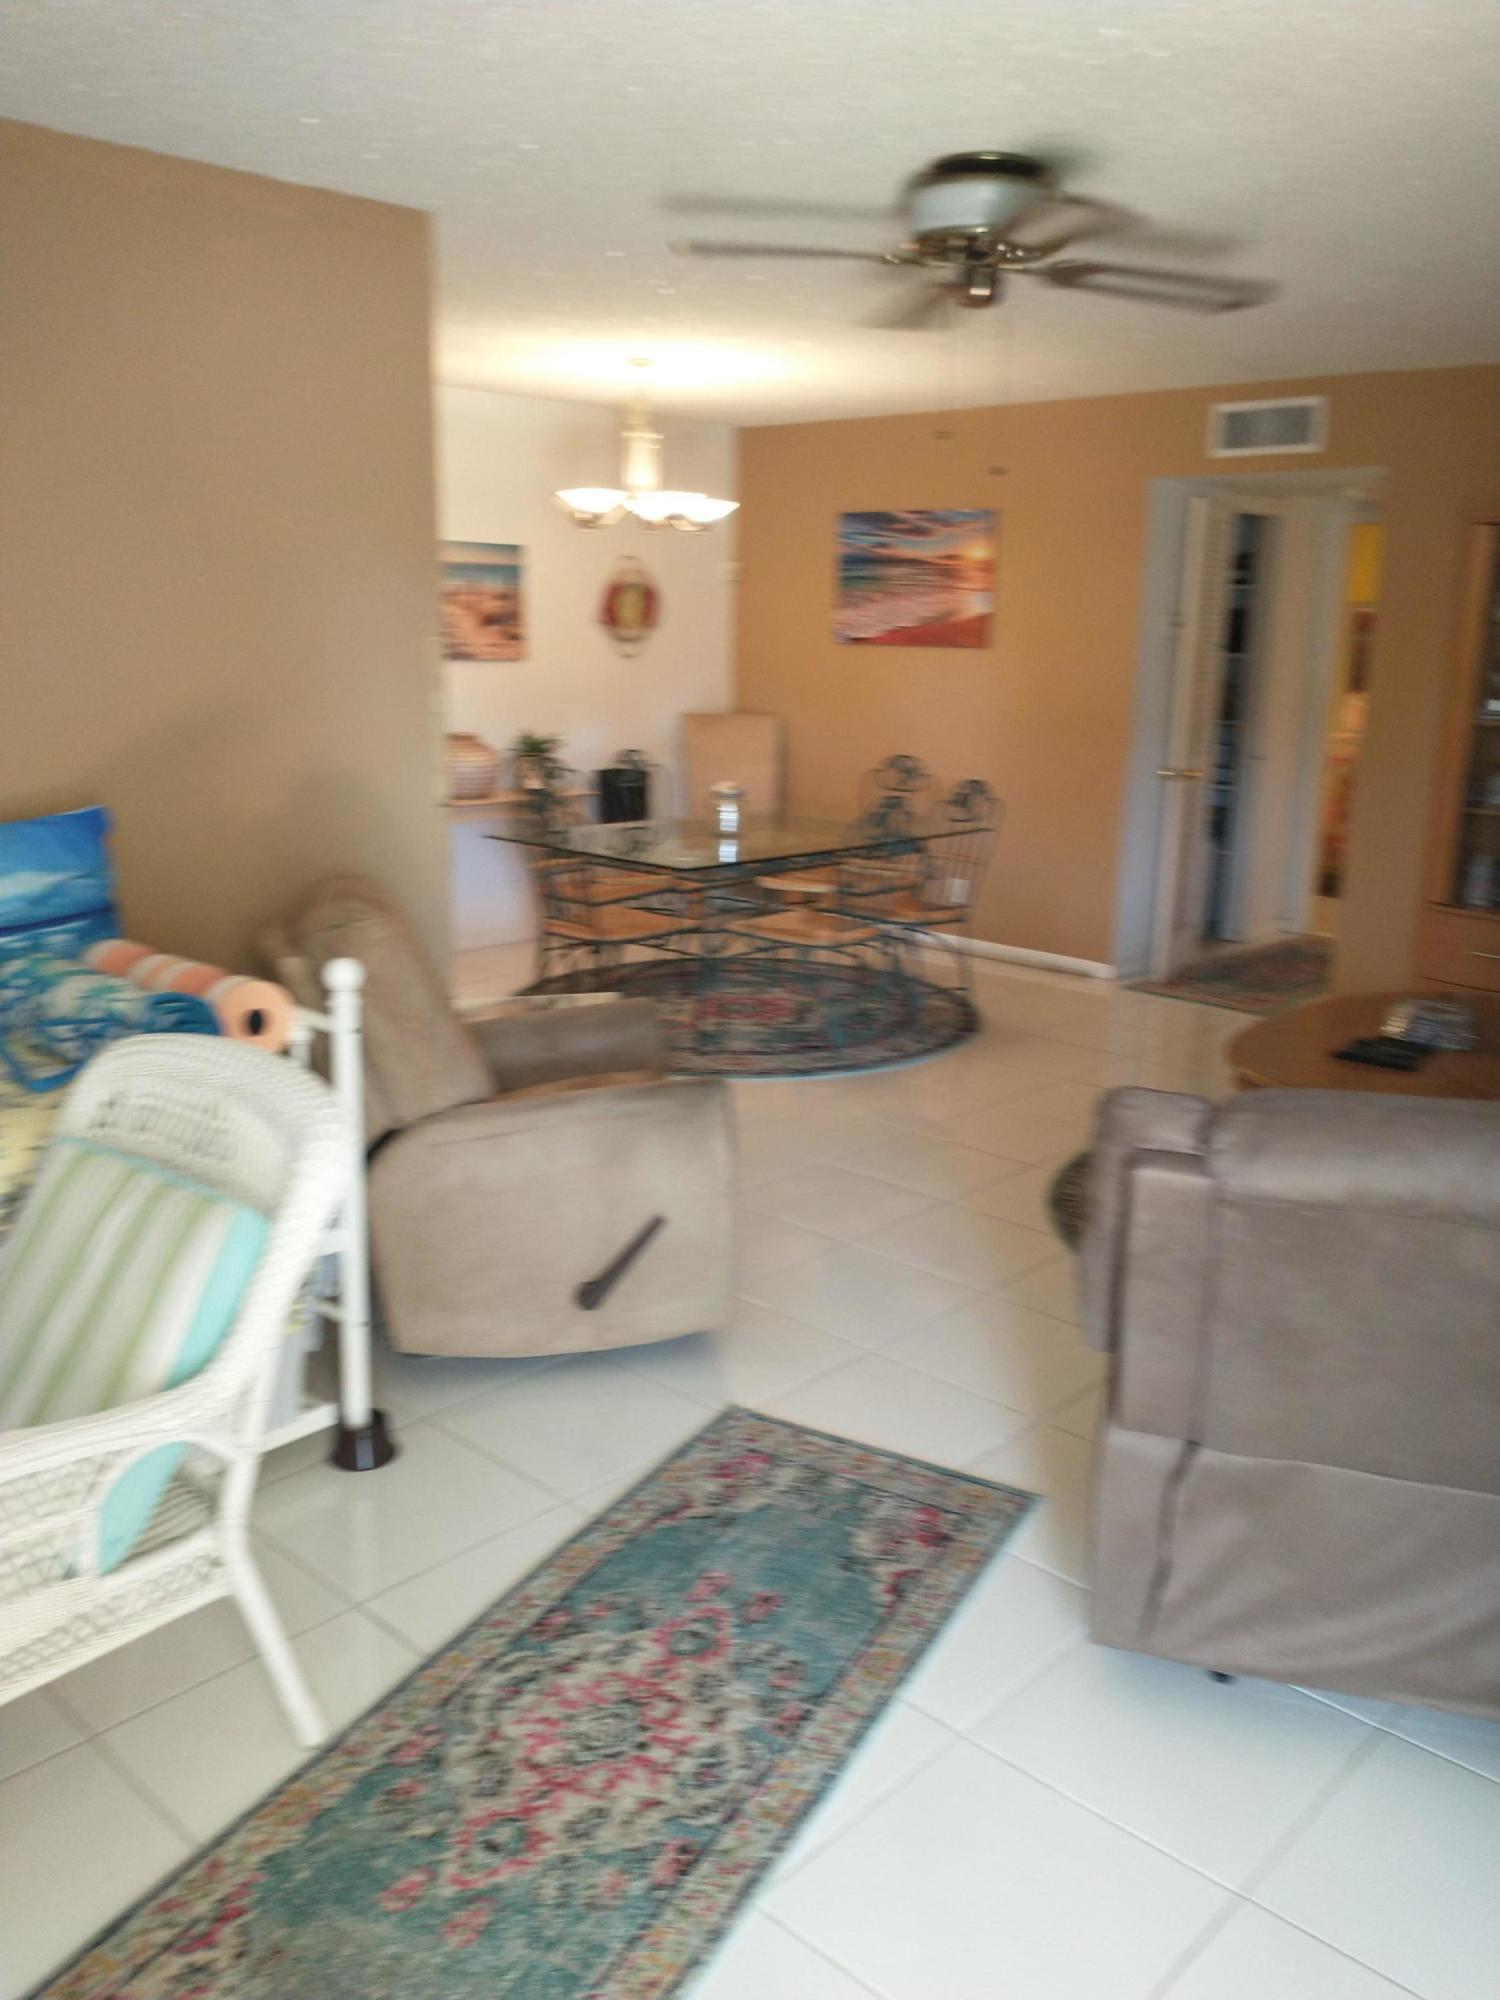 201 Country Lane B Boynton Beach, FL 33435